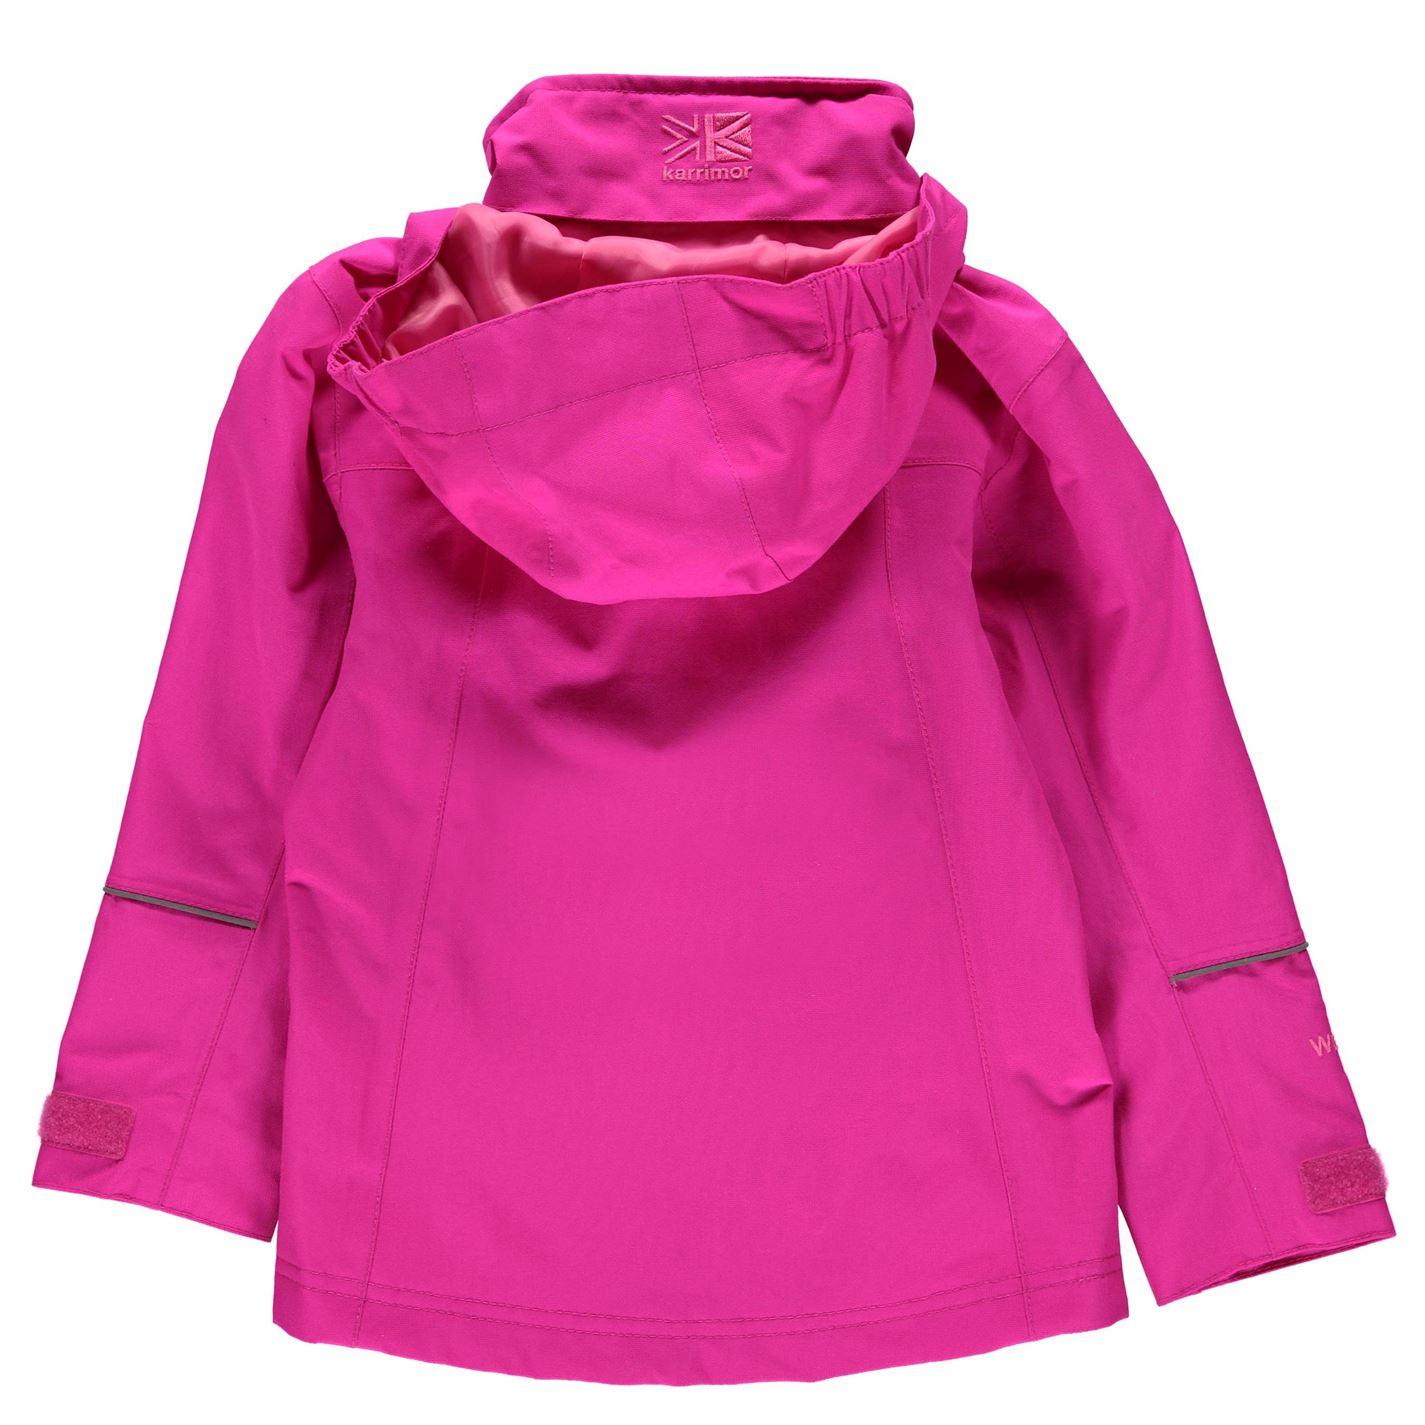 Karrimor Kids Urban Jacket Infants Fixed Hood Meshed Lining Reflective Detailing